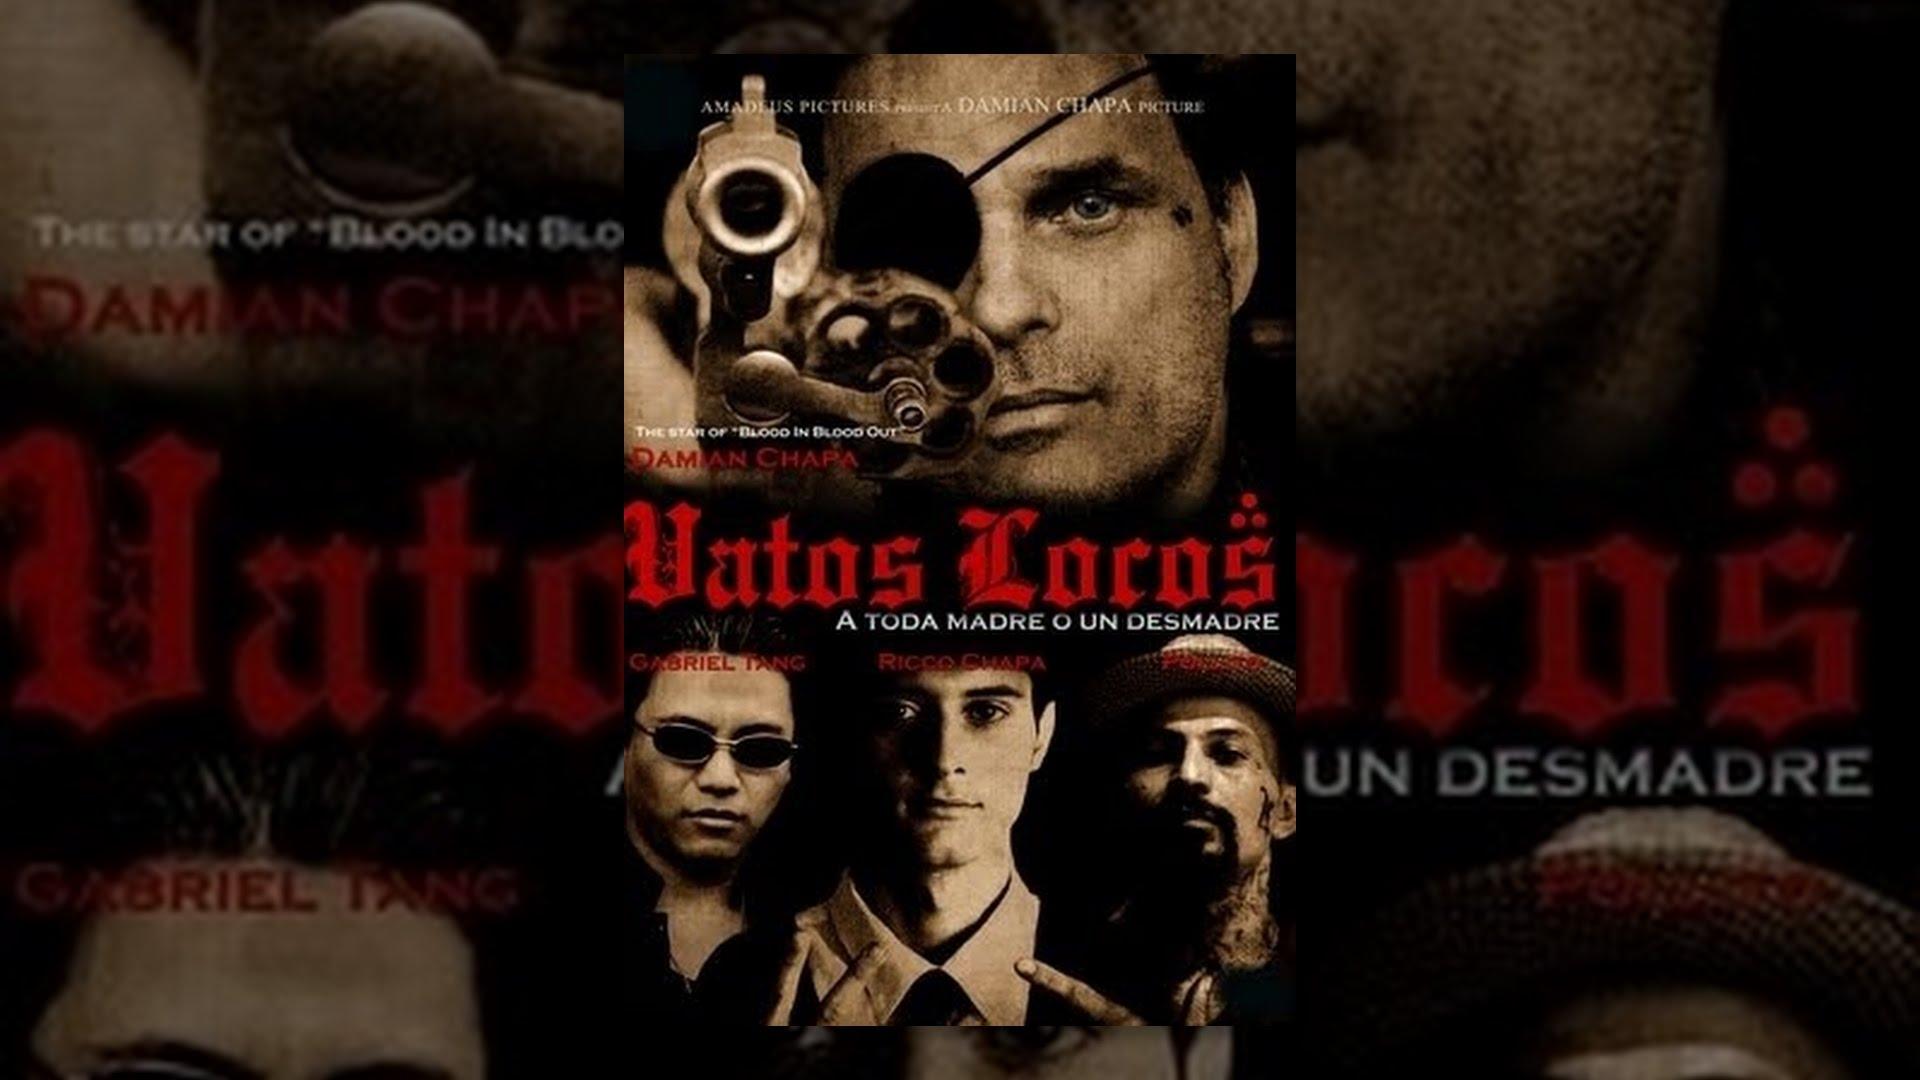 Vatos Locos - YouTube